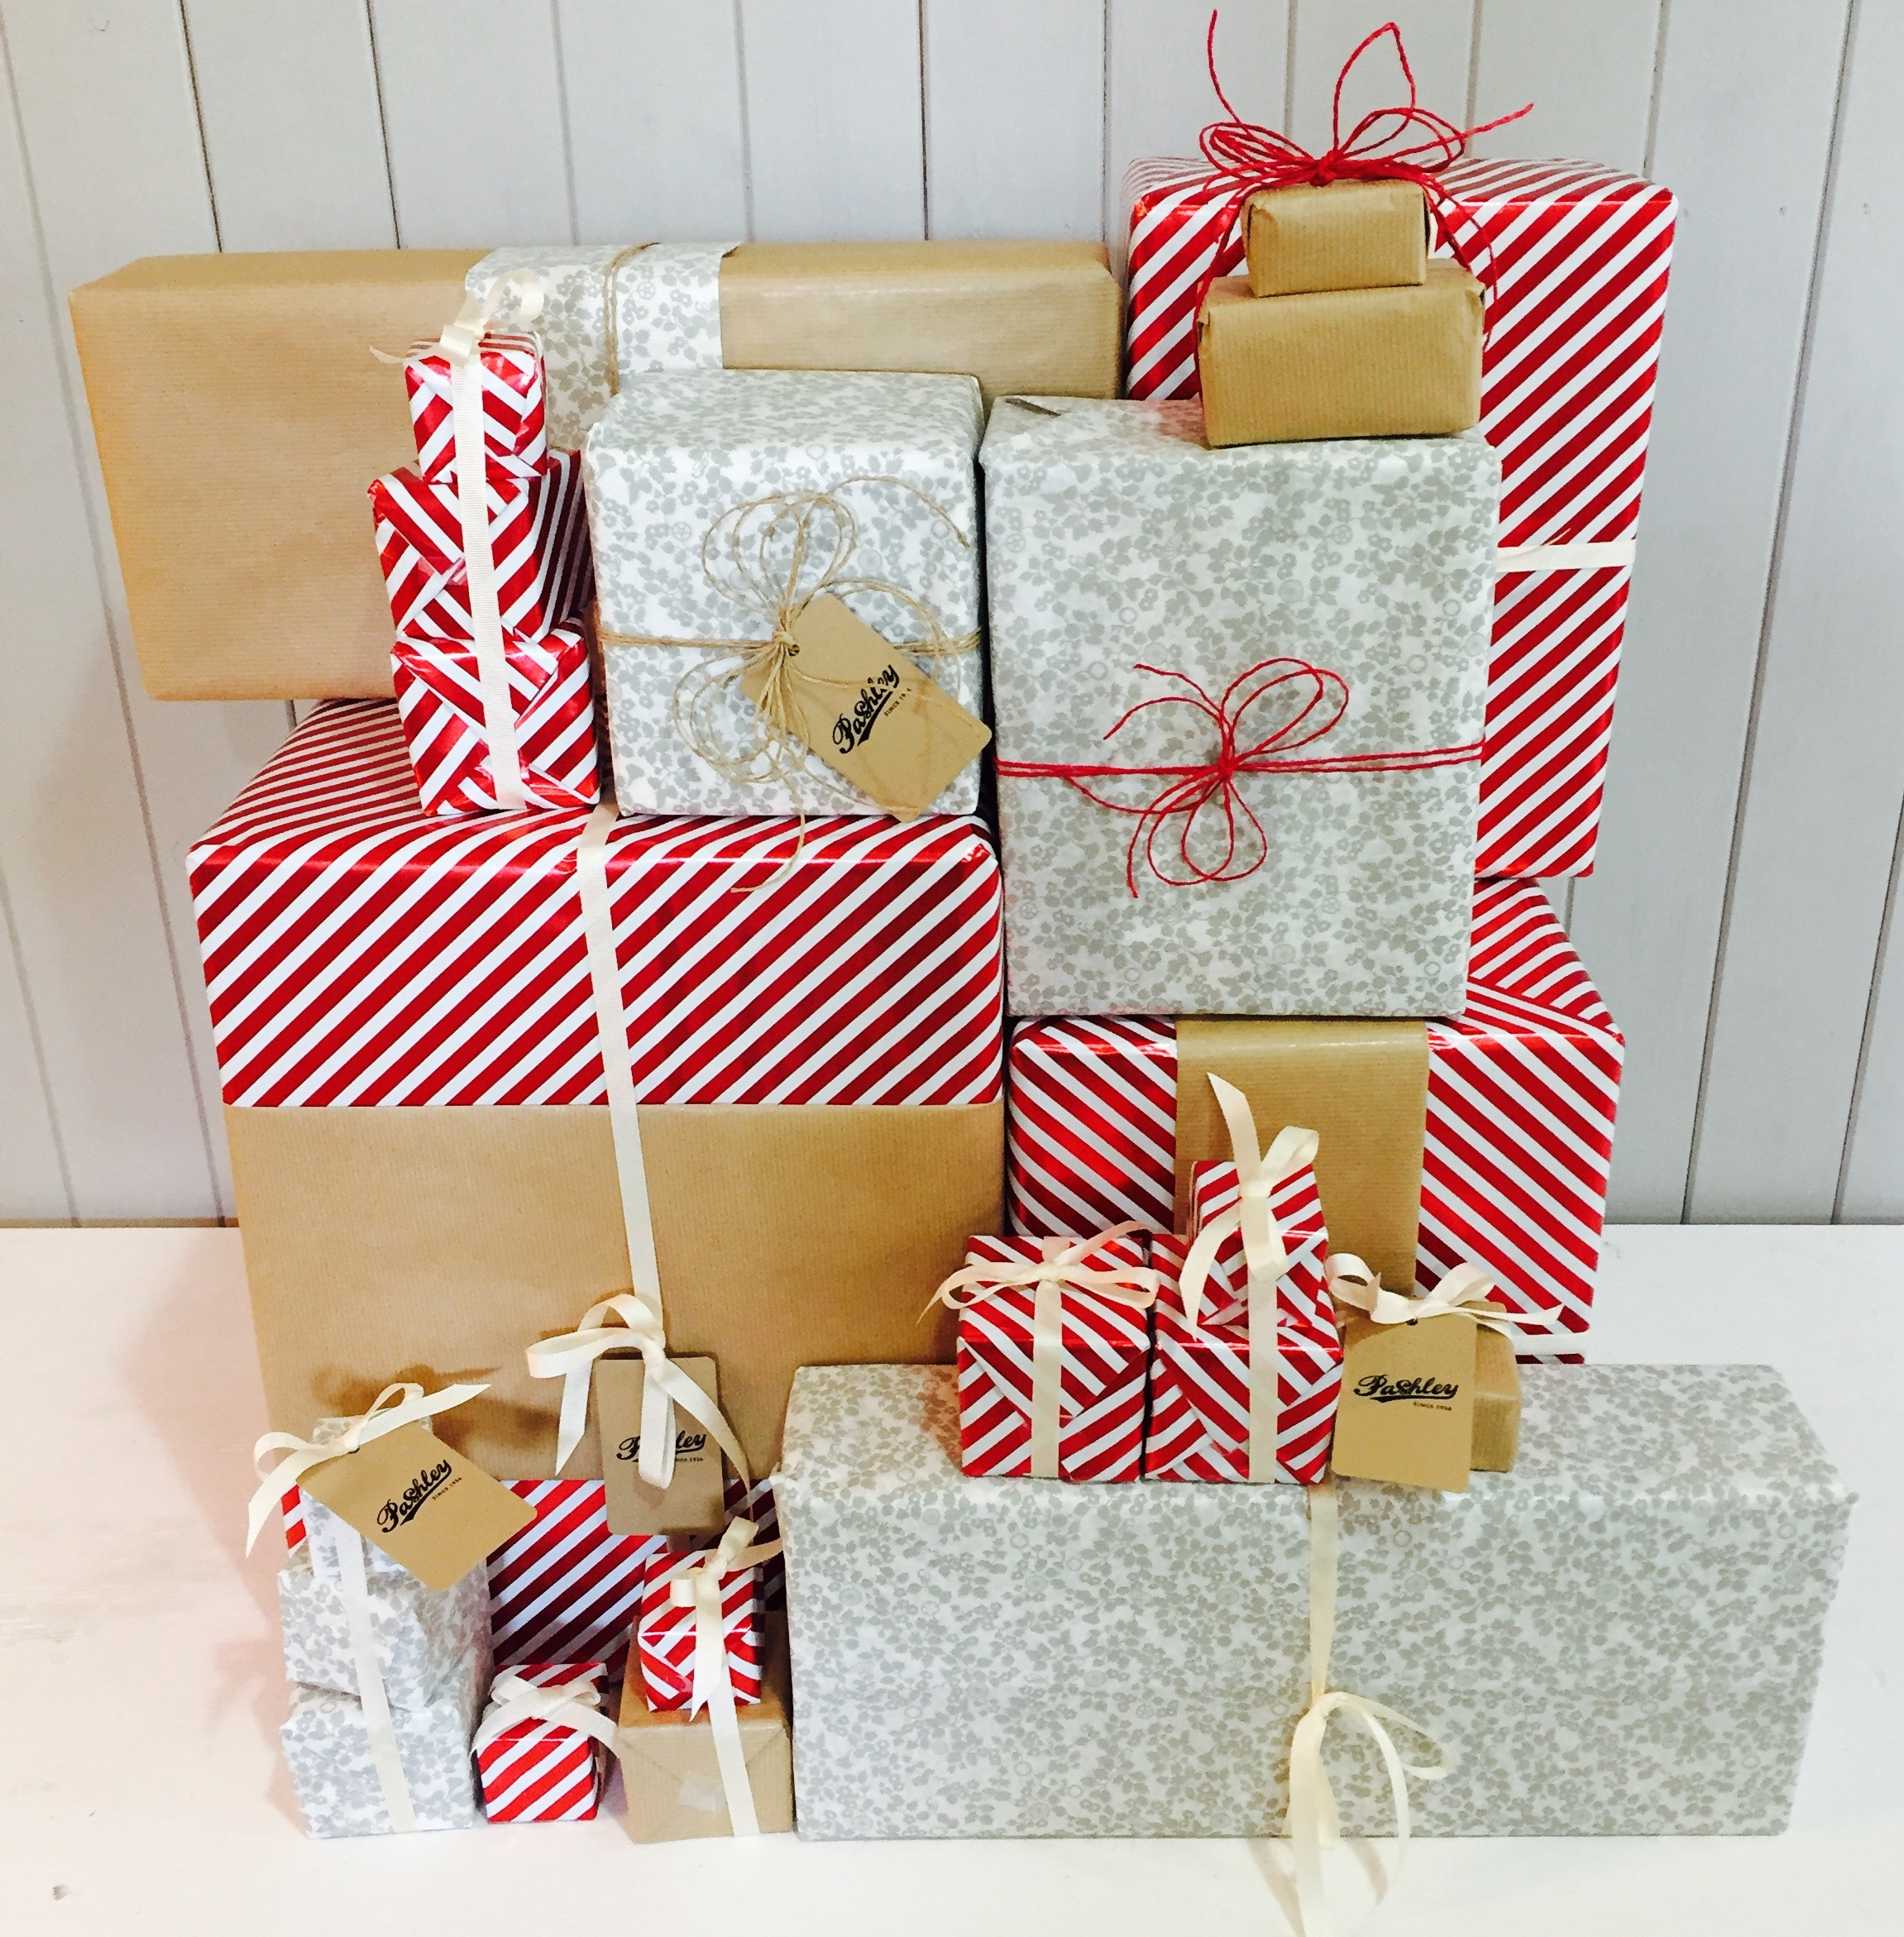 xmas gifts 1.jpg